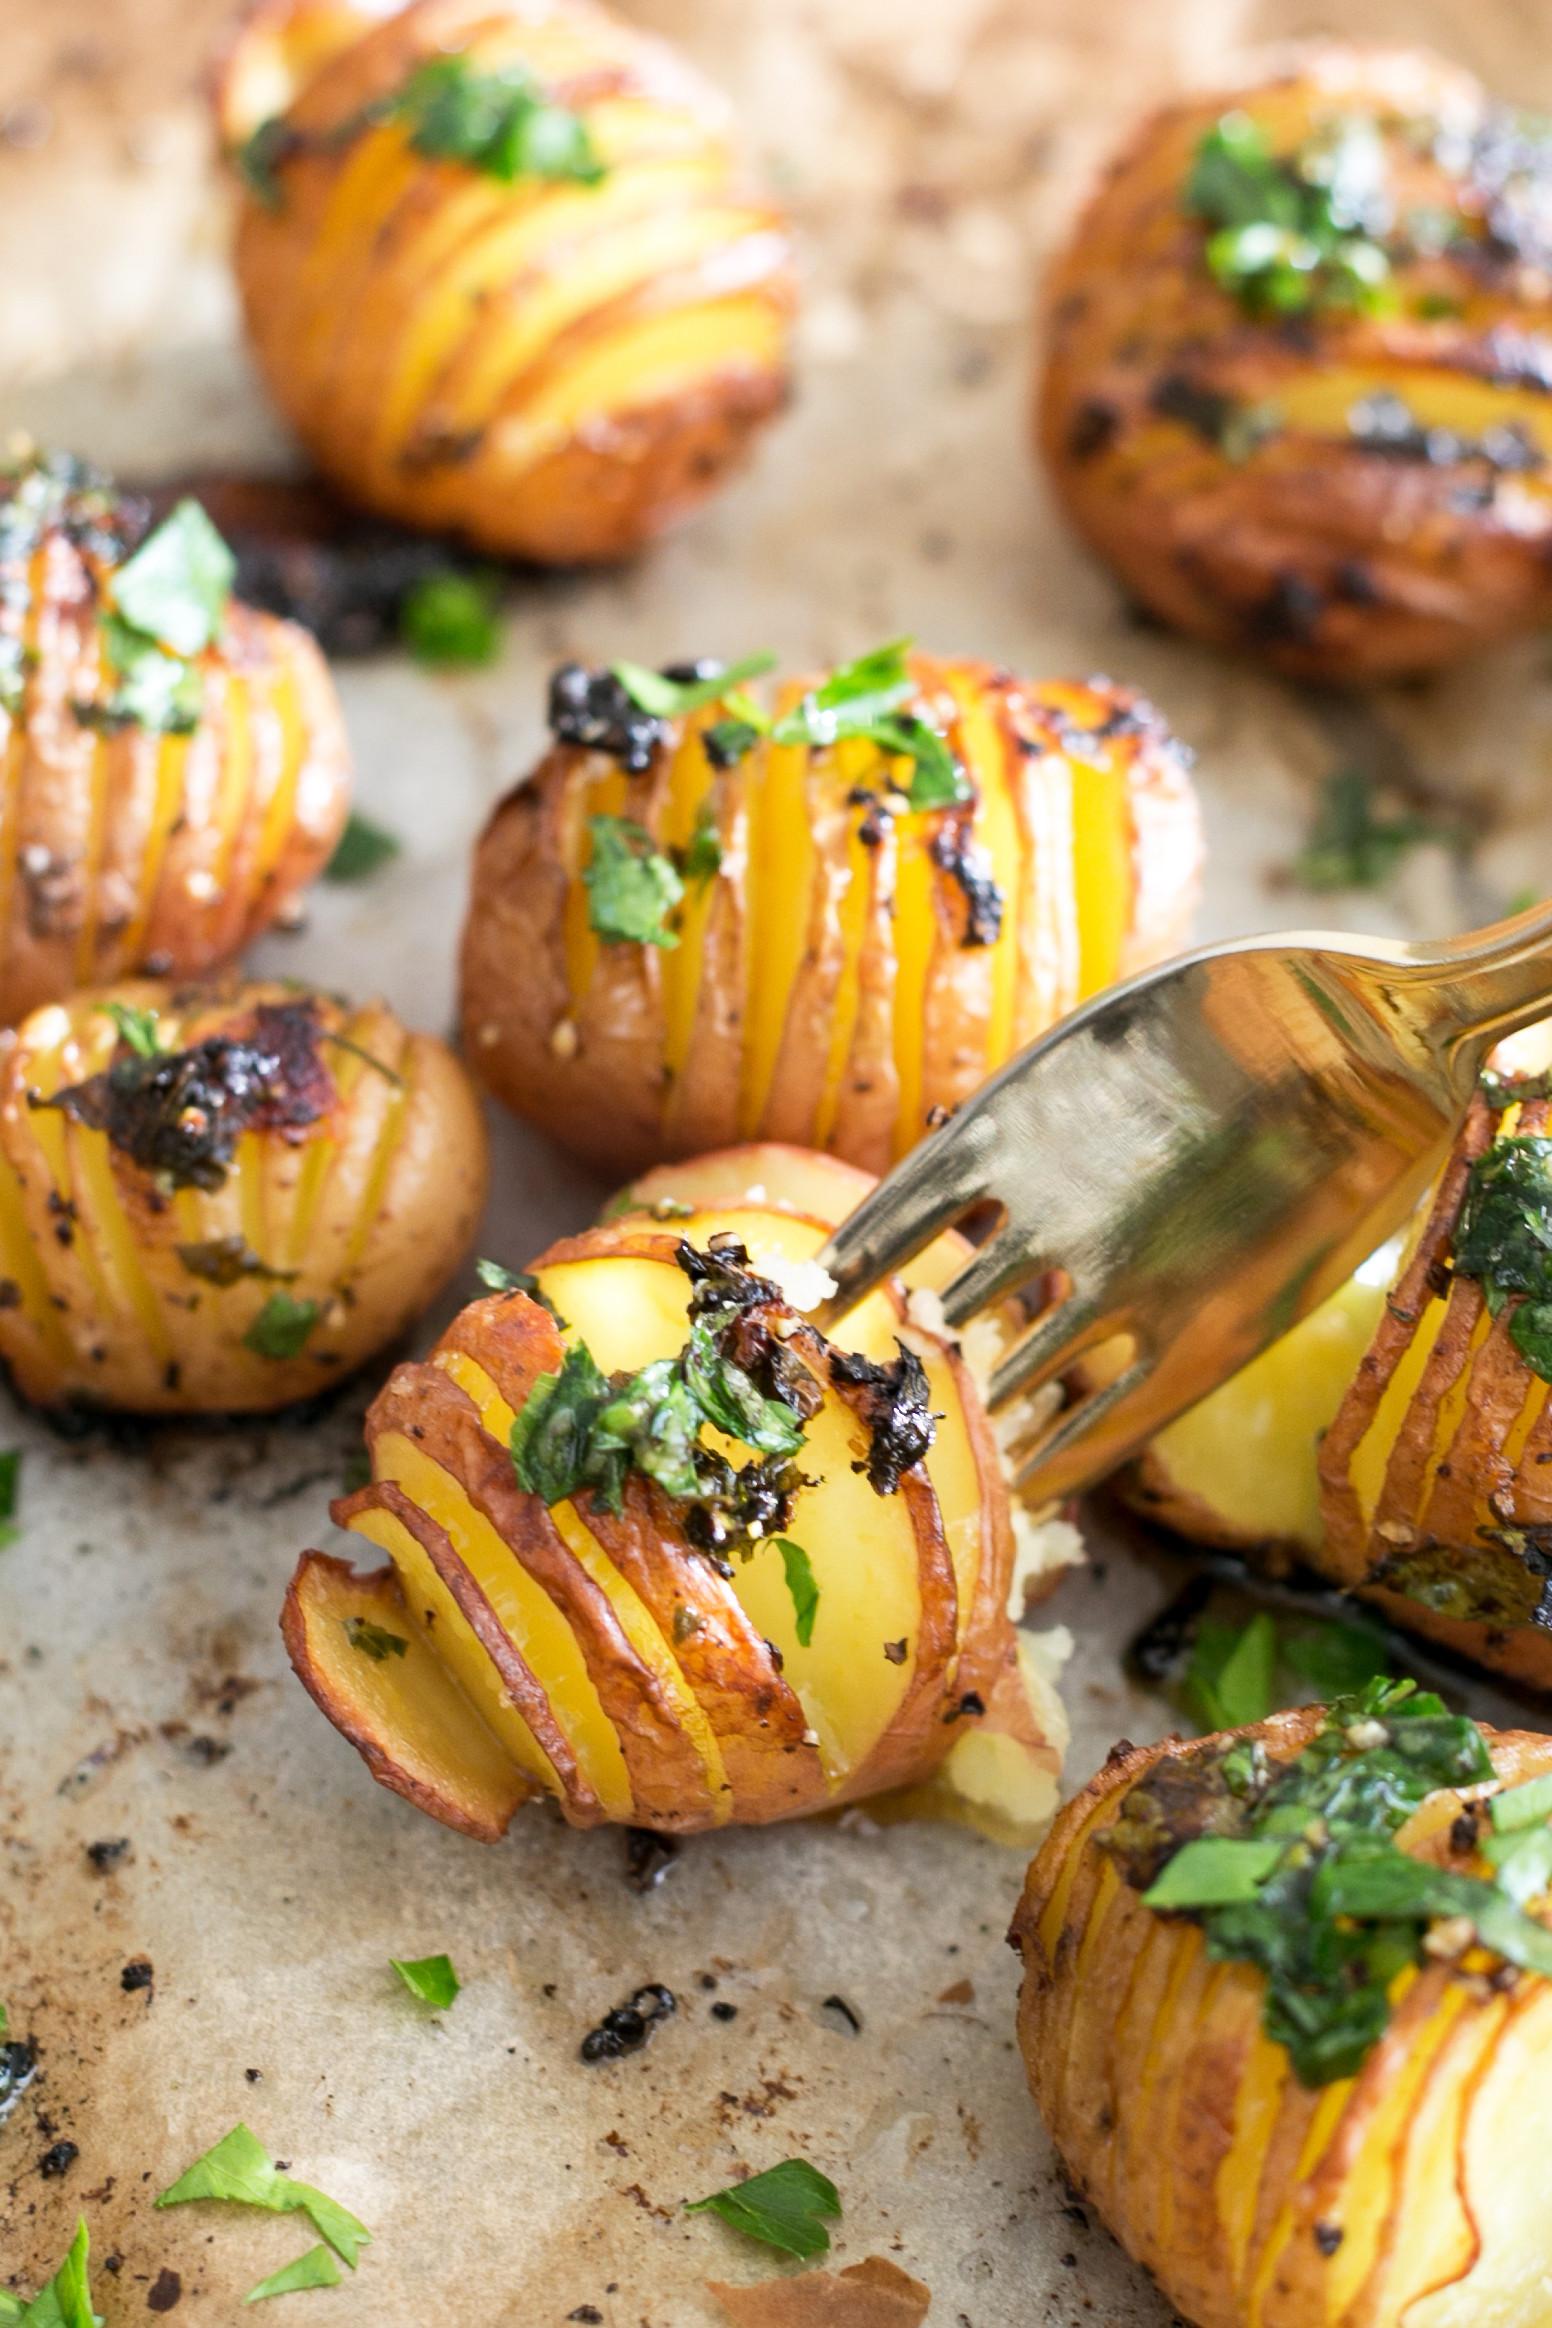 Vegetarian Recipes With Potatoes  Vegan Lemon Garlic Herb Roasted Potatoes